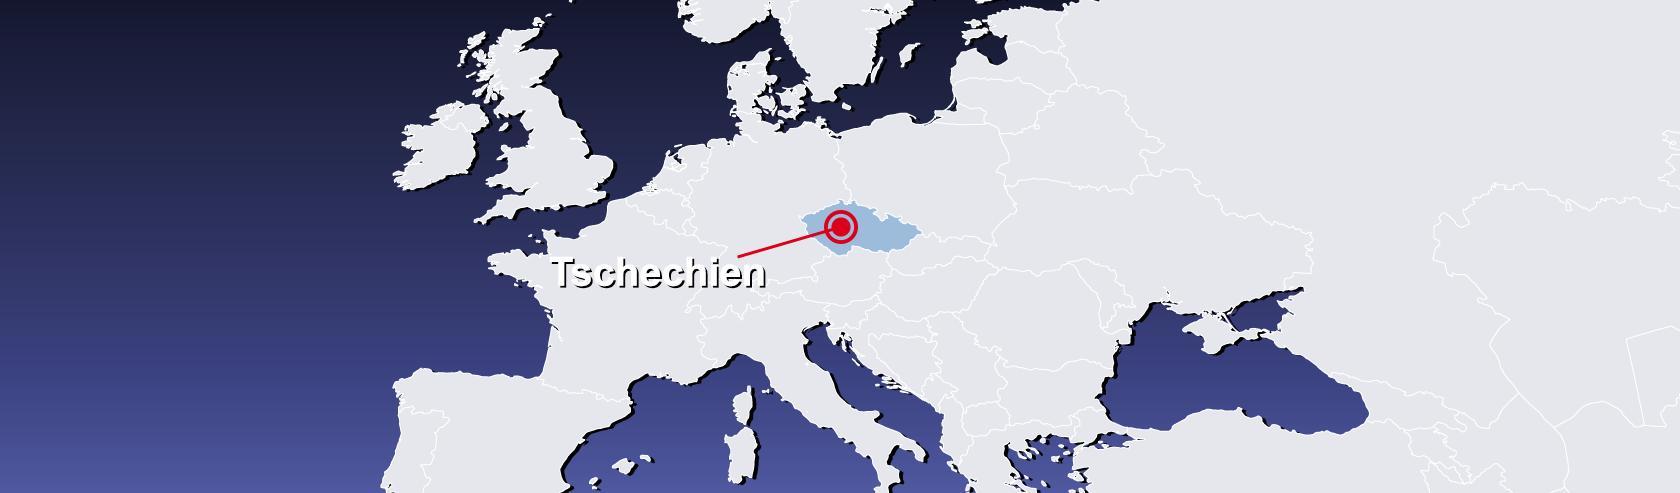 Transport-Tschechien